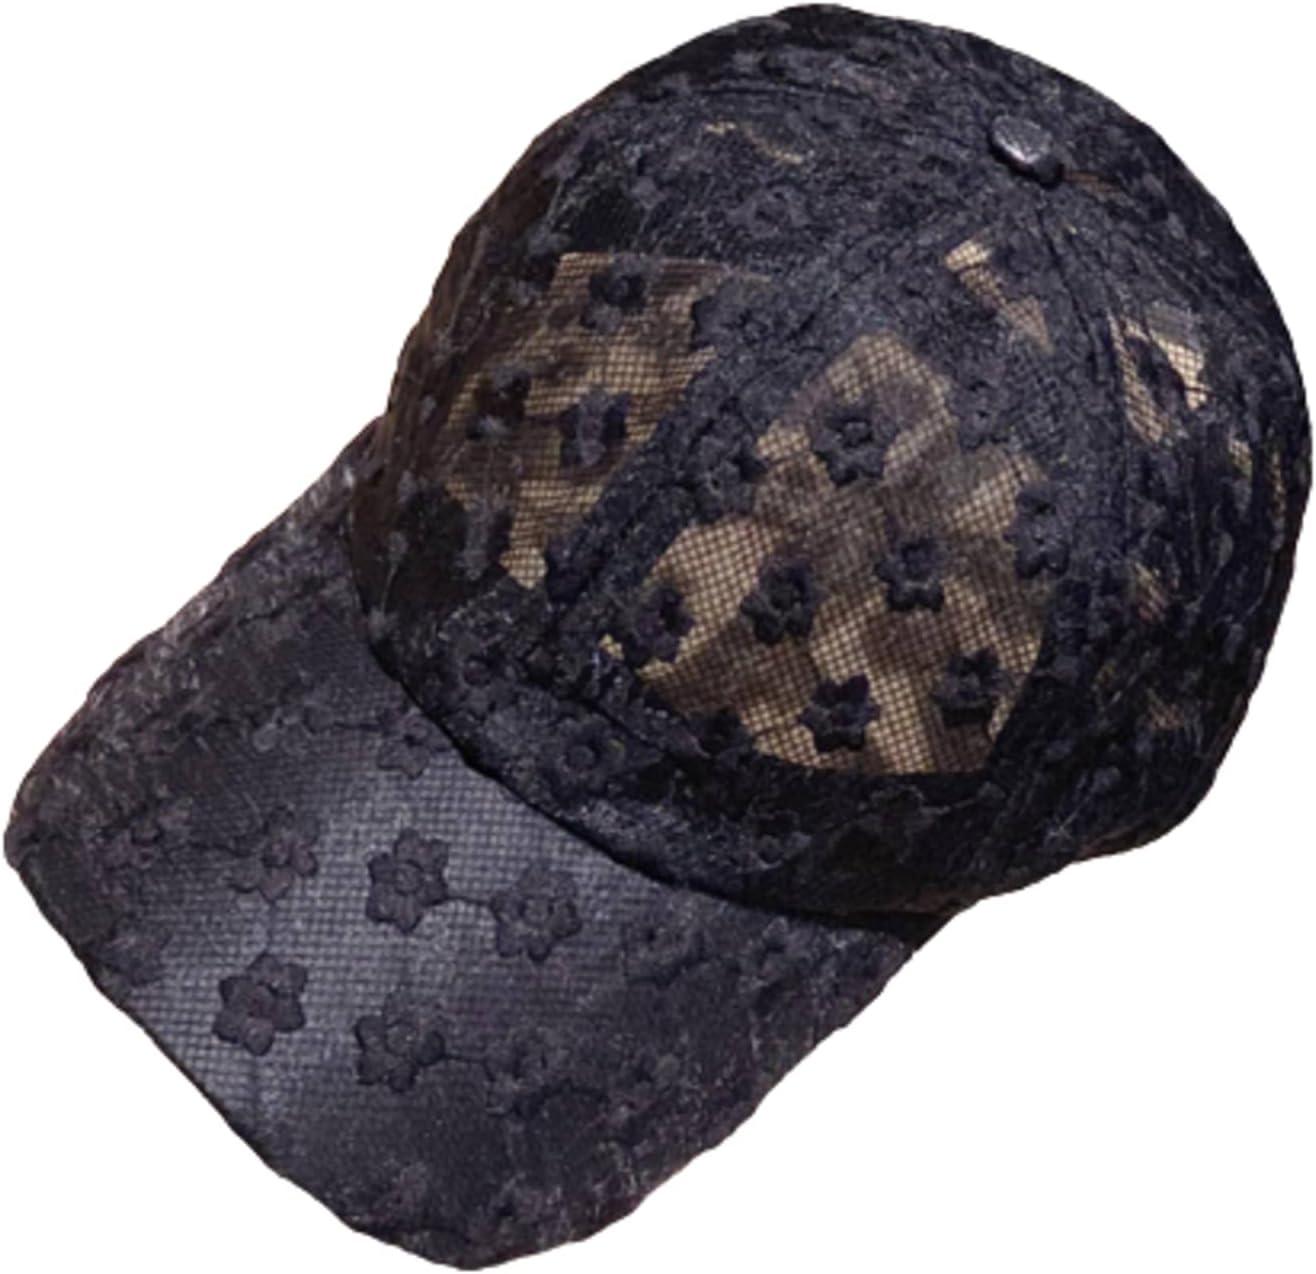 Lace Female Hat Summer Baseball Cap Fashion Sunshade Hollow Hat Black Breathable Beach Sunscreen Hat Women's